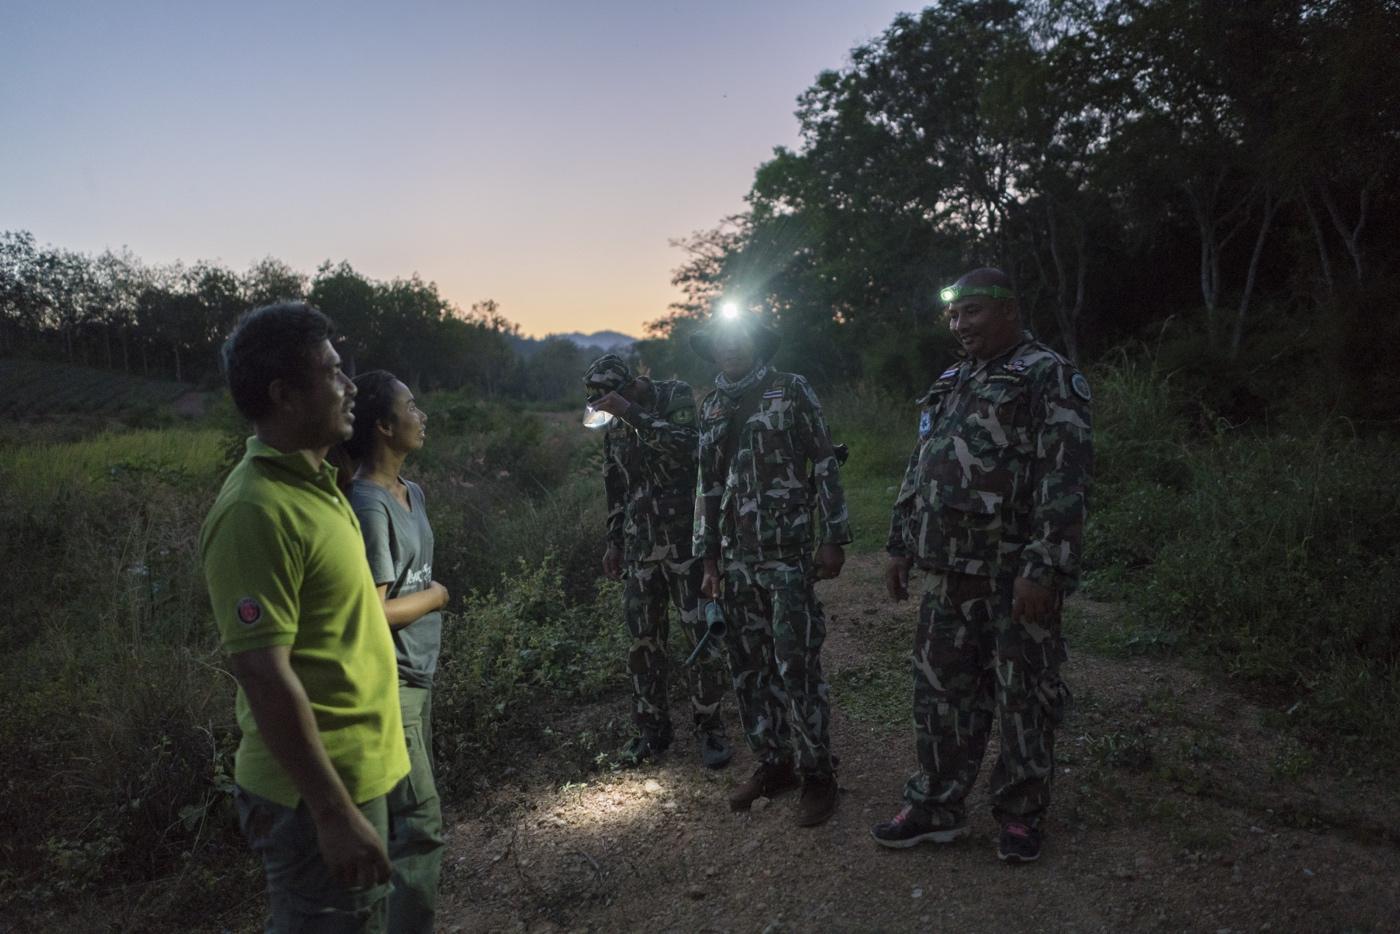 WWF Thailand, Kui Buri - Night Patrol